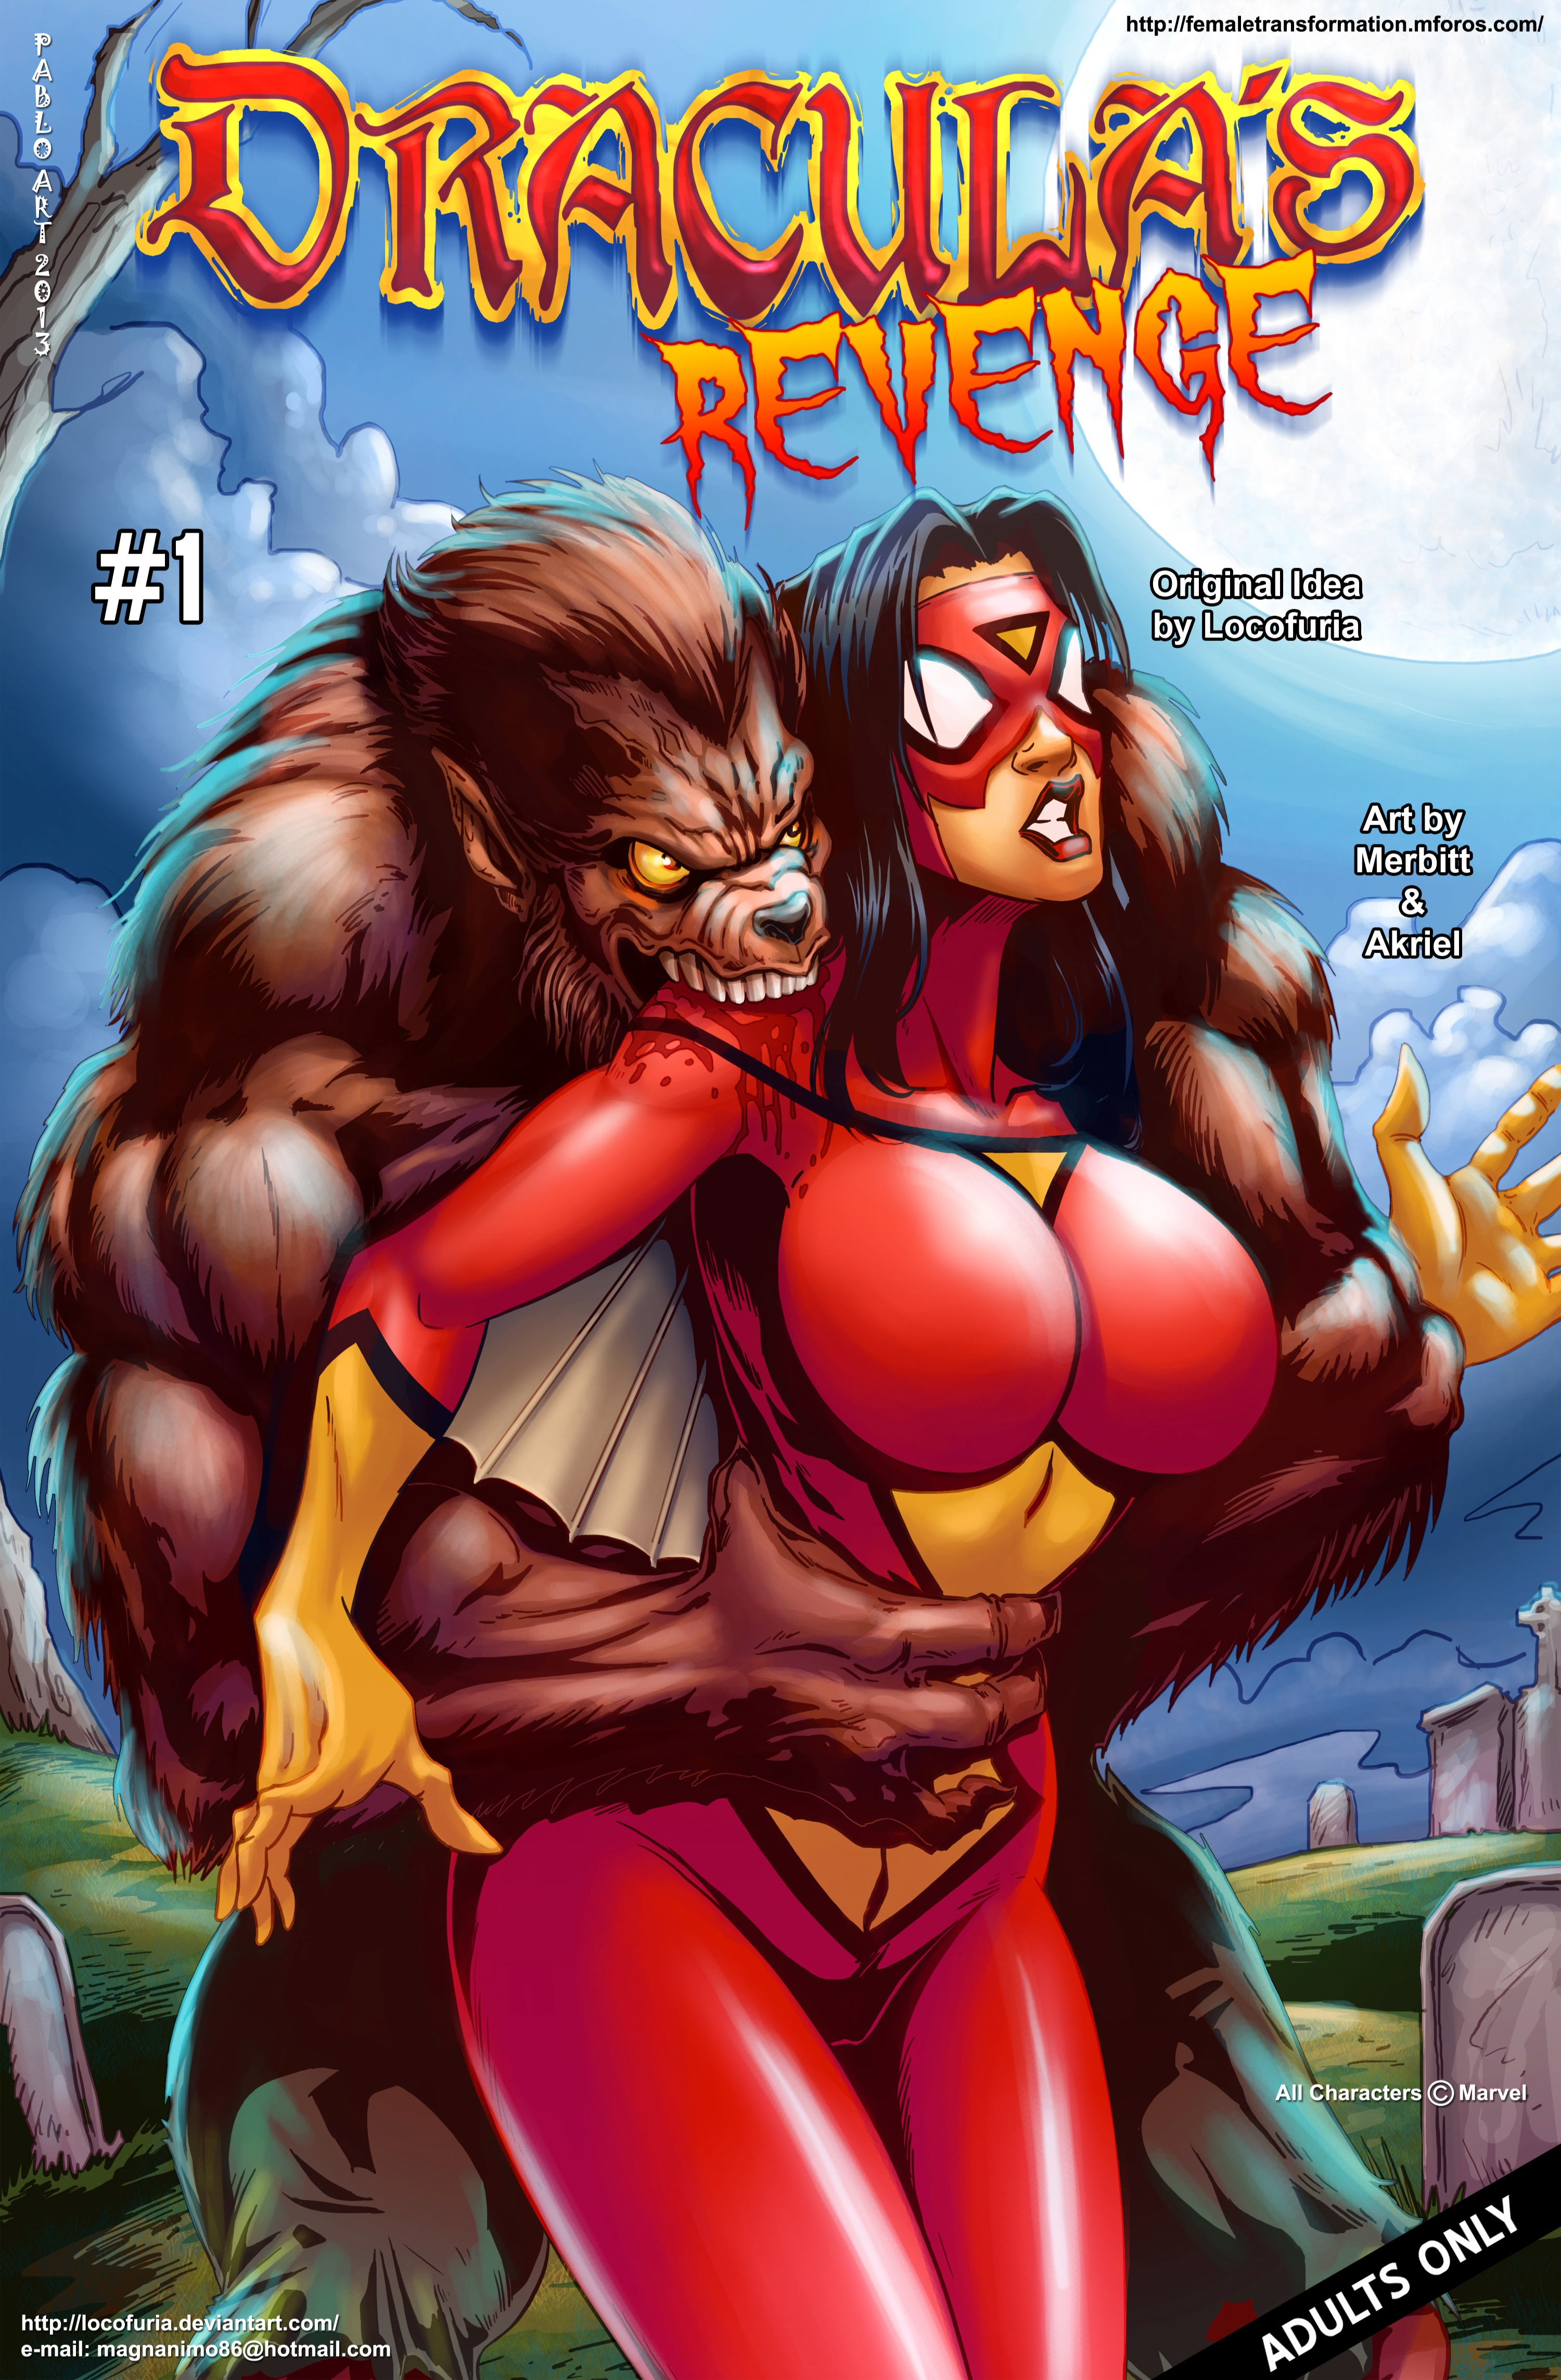 Goodcomix.tk Spider-Woman - [Locofuria] - Draculas Revenge